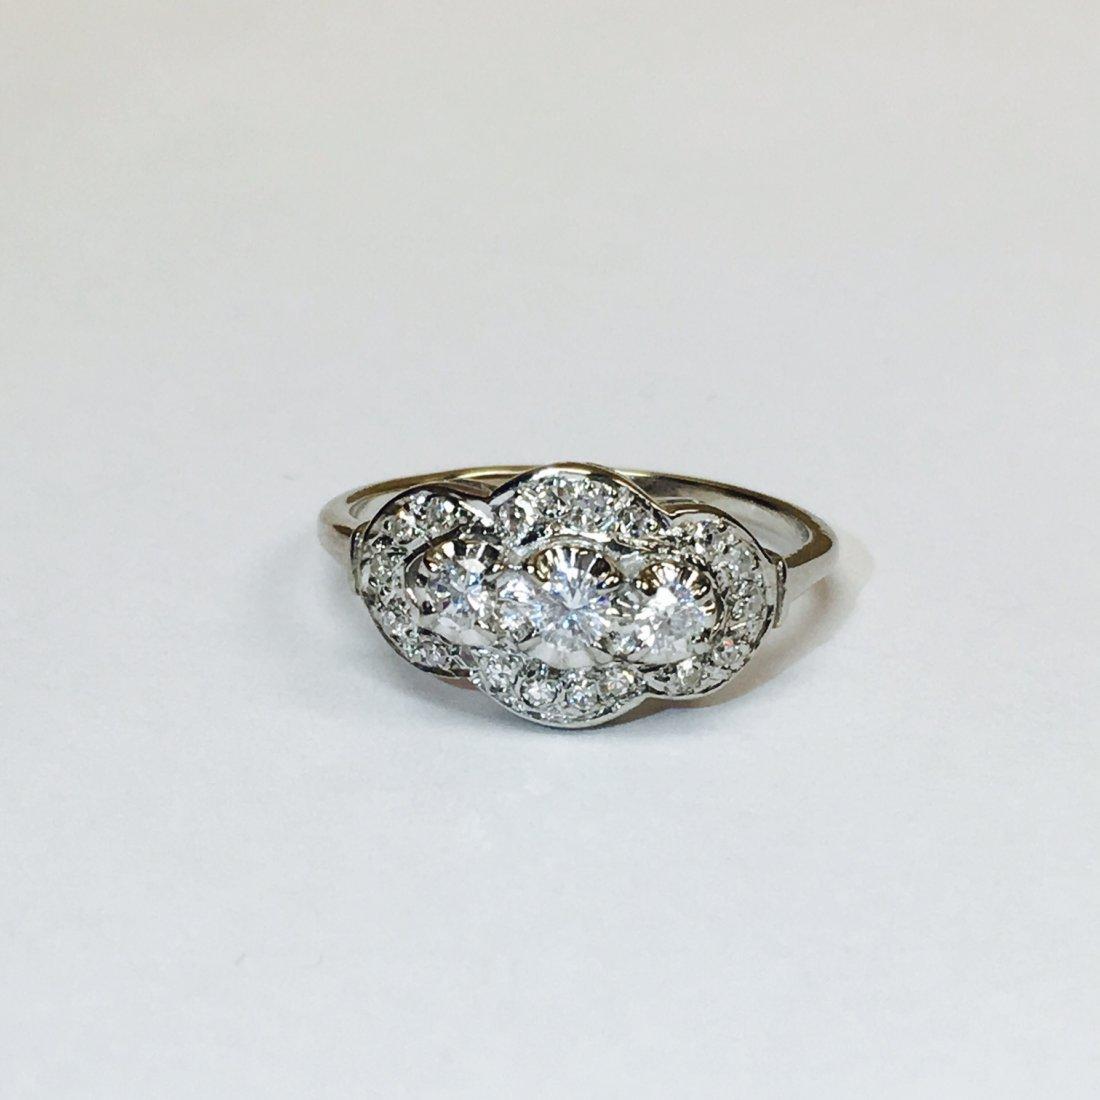 14K White Gold, Antique 1.00 Carat Diamond Ring - 4